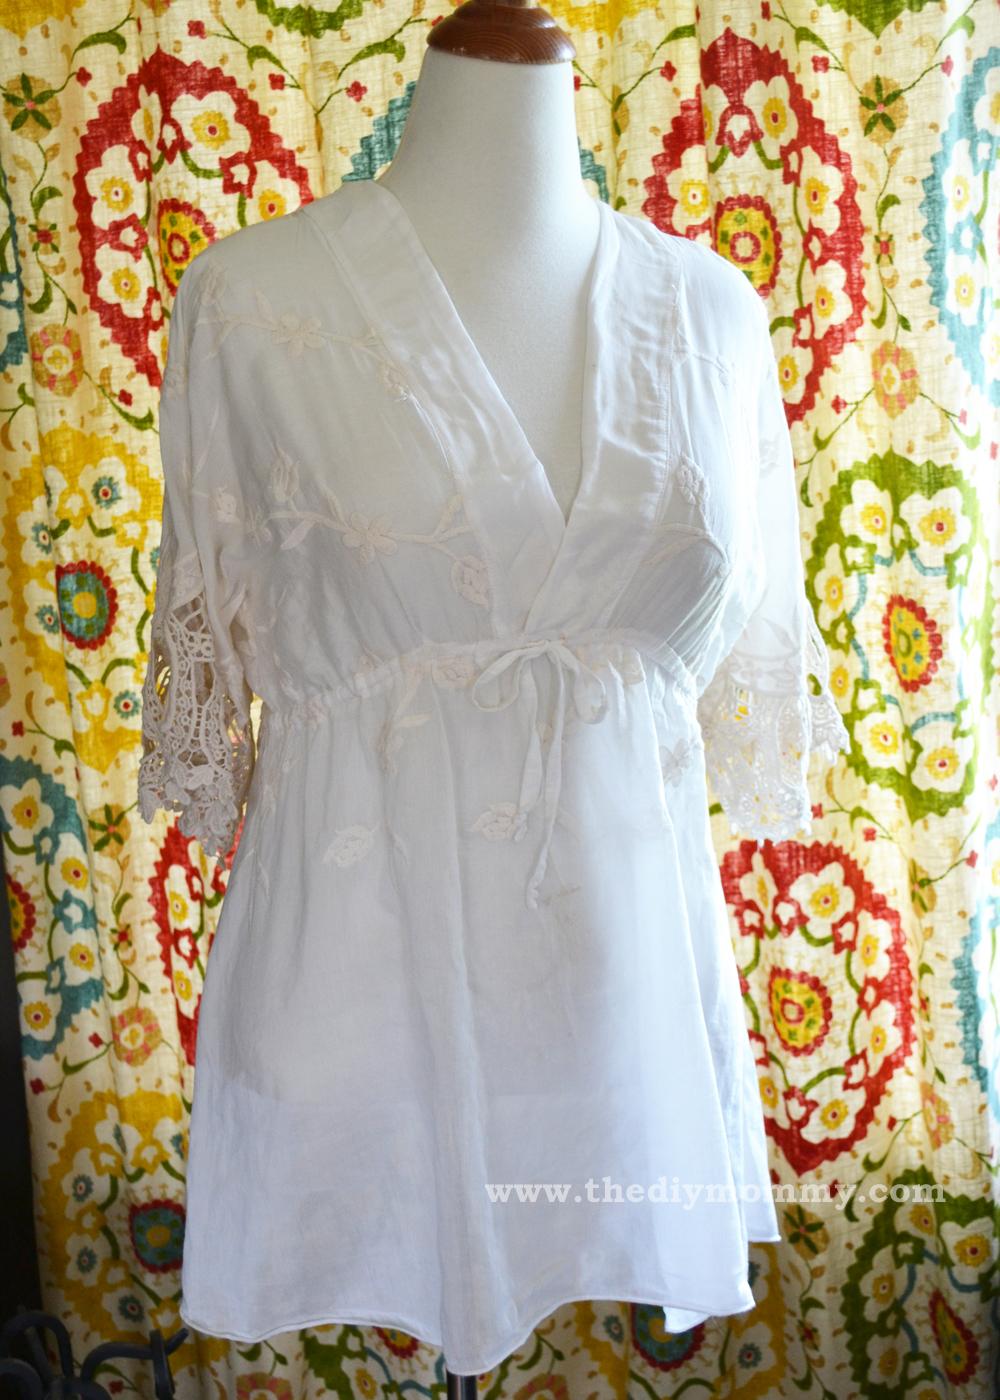 Sew a Boho Blouse — A Simplicity Pattern Review